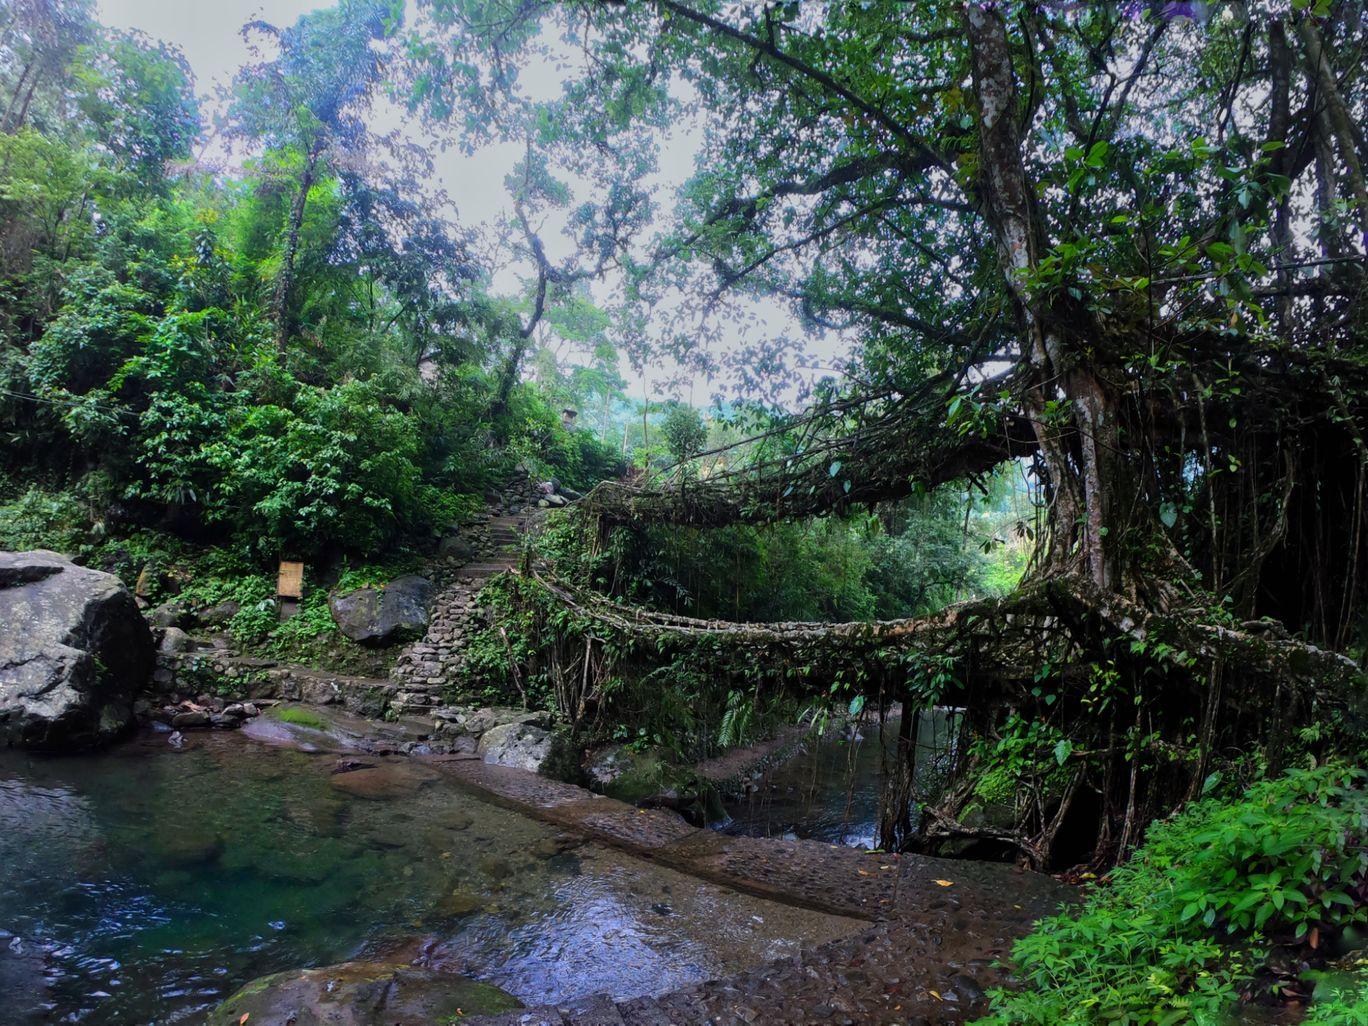 Photo of Double Decker Living Root Bridge By d dash